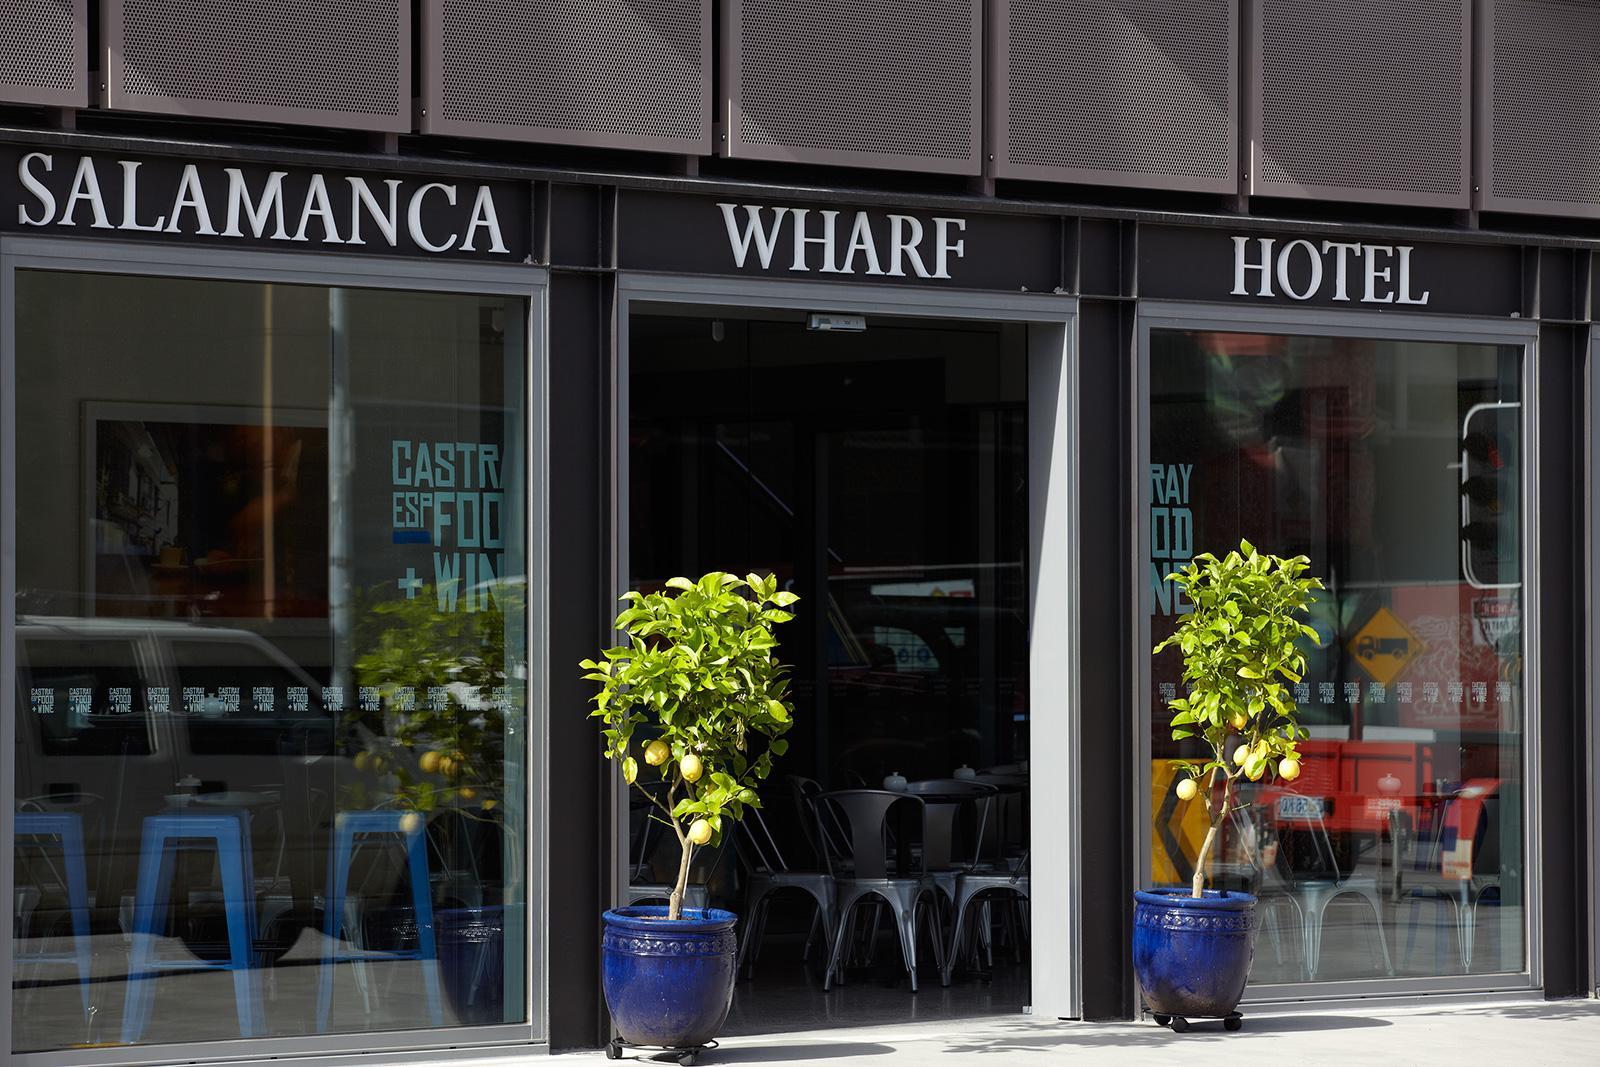 Front Entrance to Salamanca Wharf Hotel